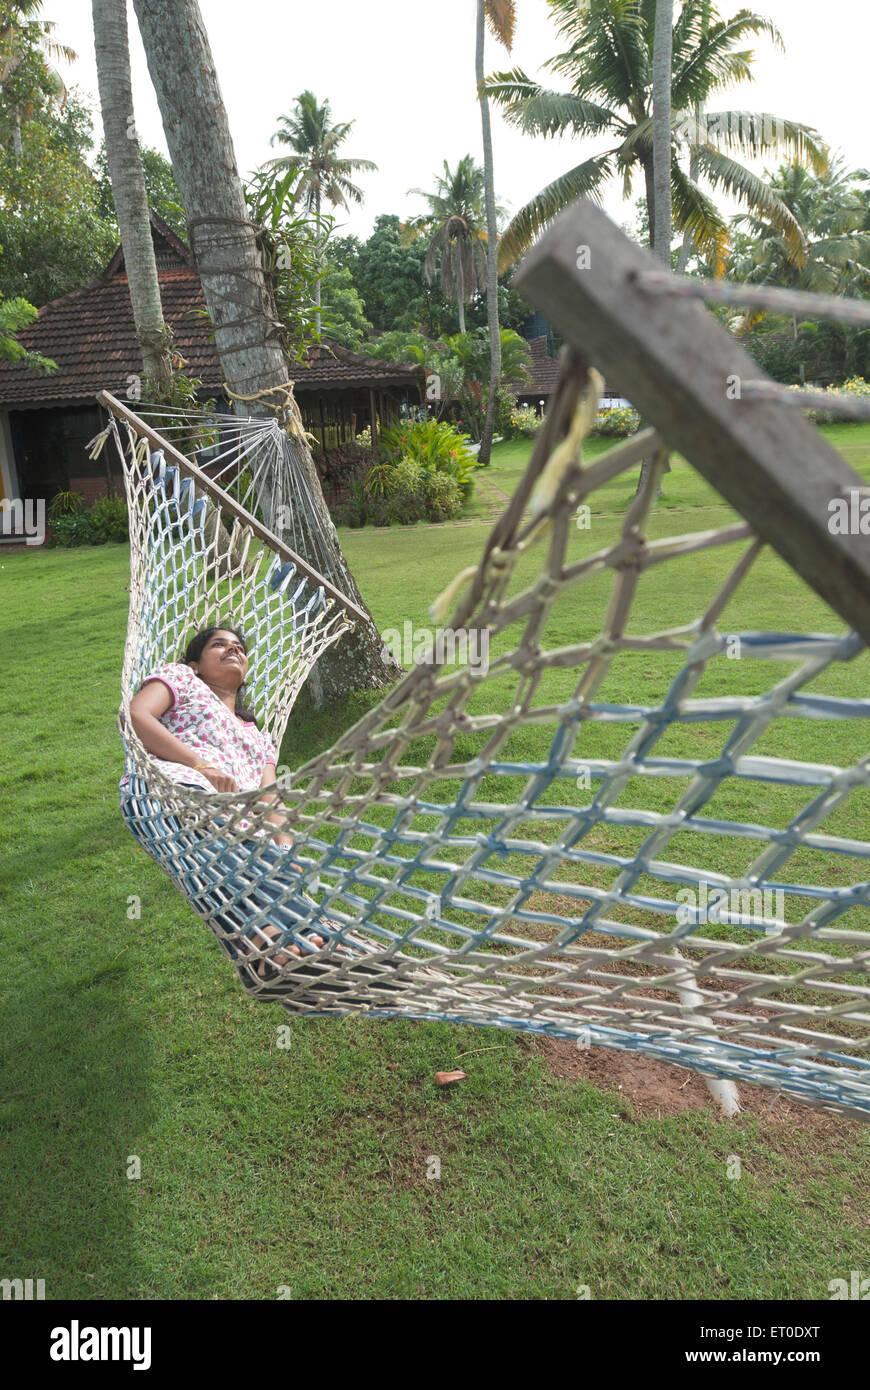 Lady resting in hammock in heritage lake resort ; Kuttanad ; Alleppey Alappuzha ; Kerala ; India MR#777L - Stock Image